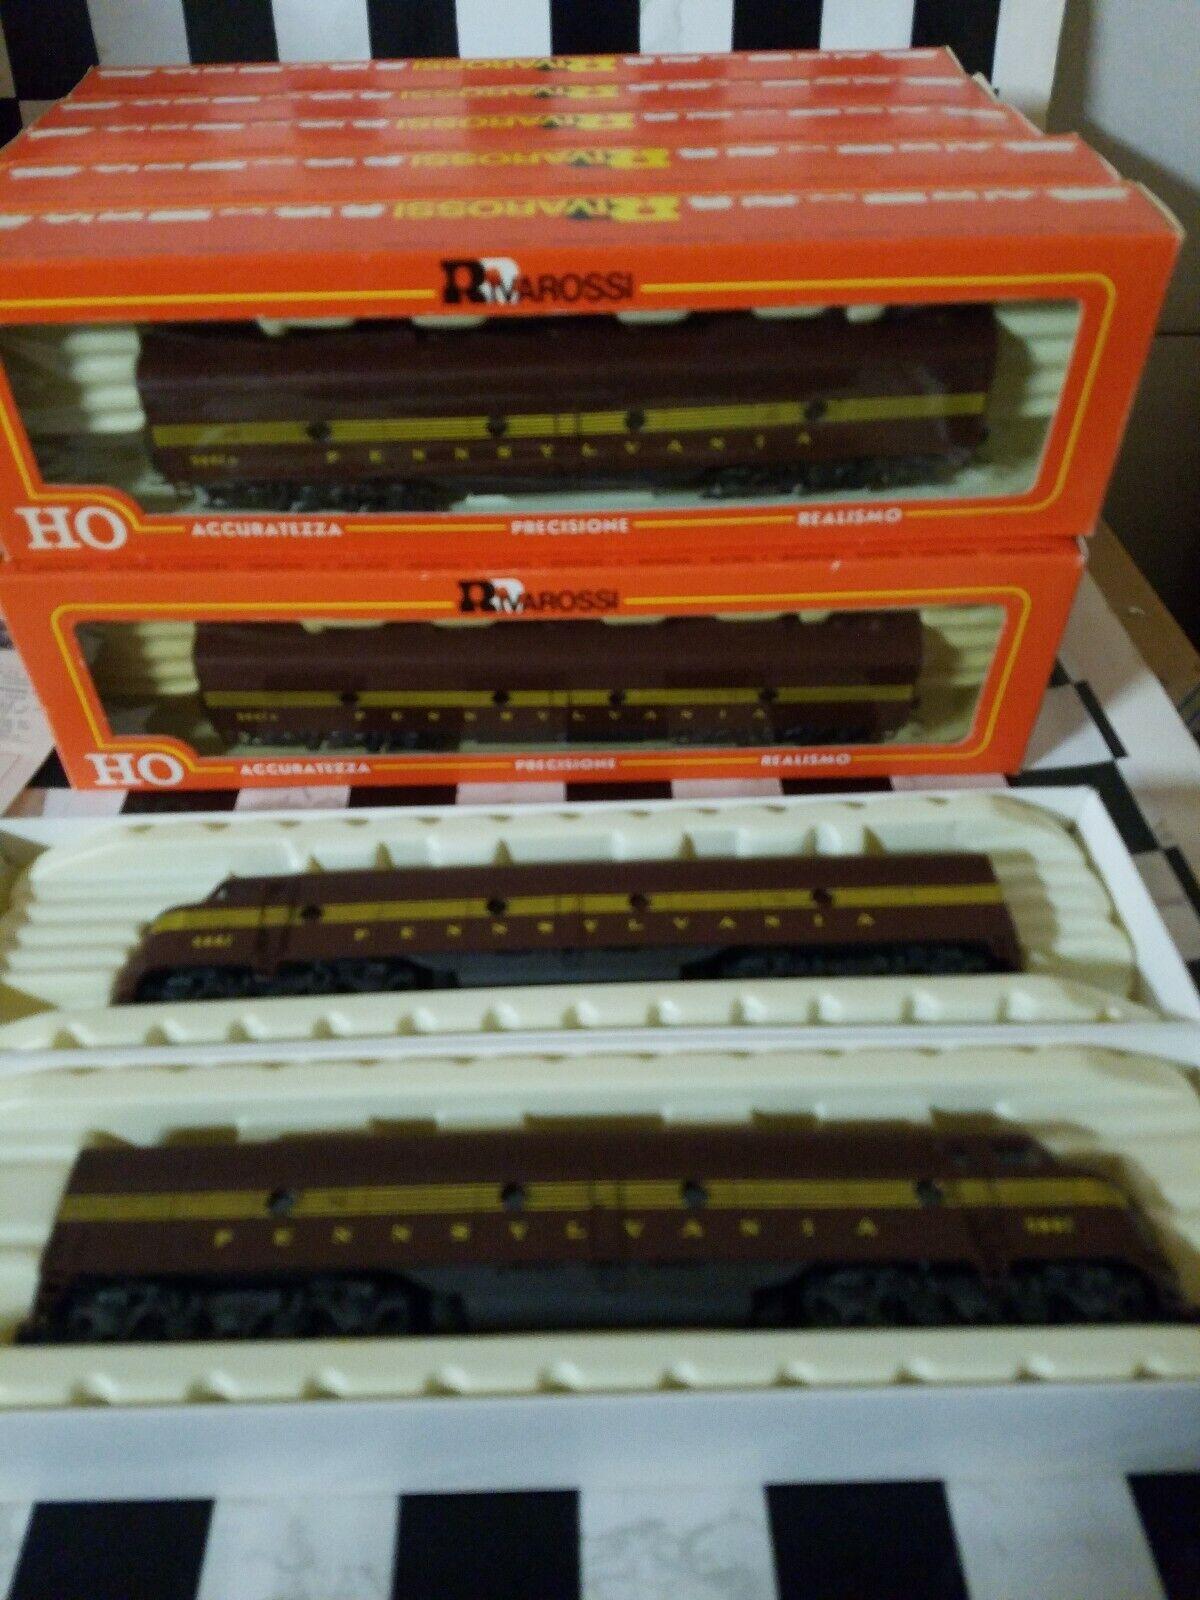 Rivarossi HO Pennsylvania  12 piece set